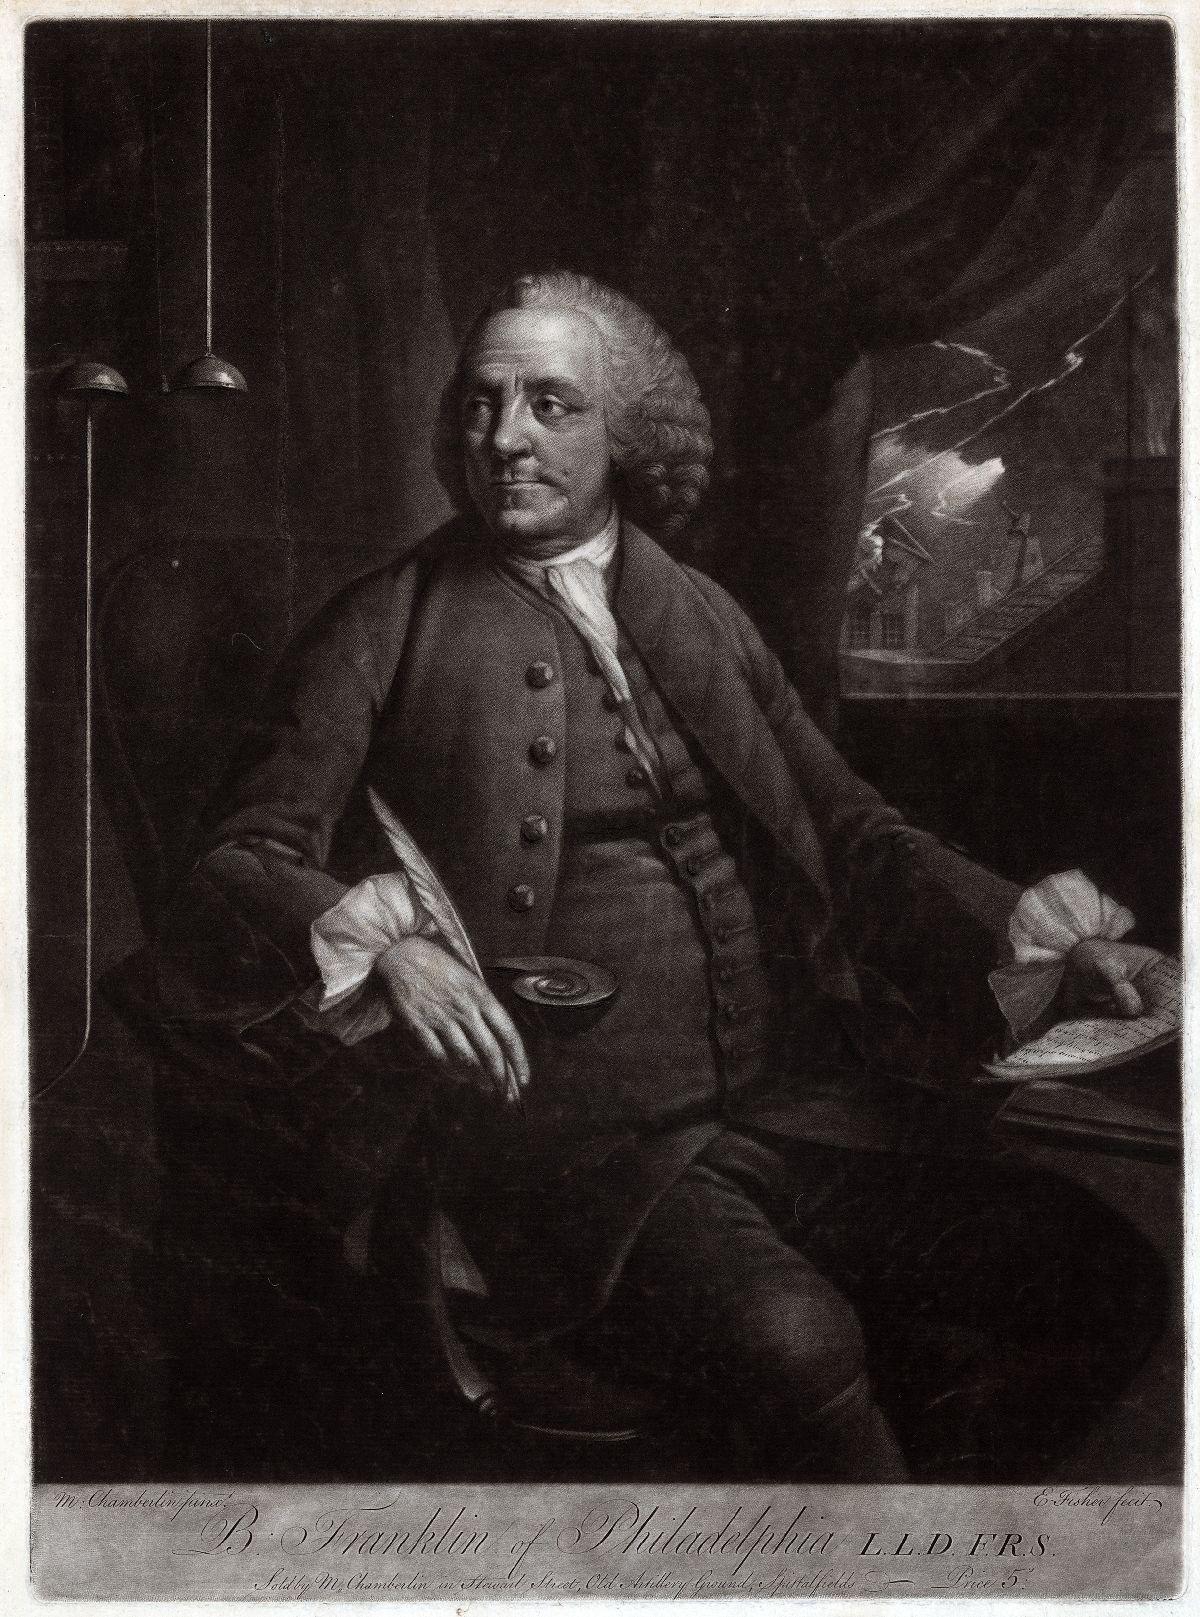 Ben Franklin, inventor of the lightning rod